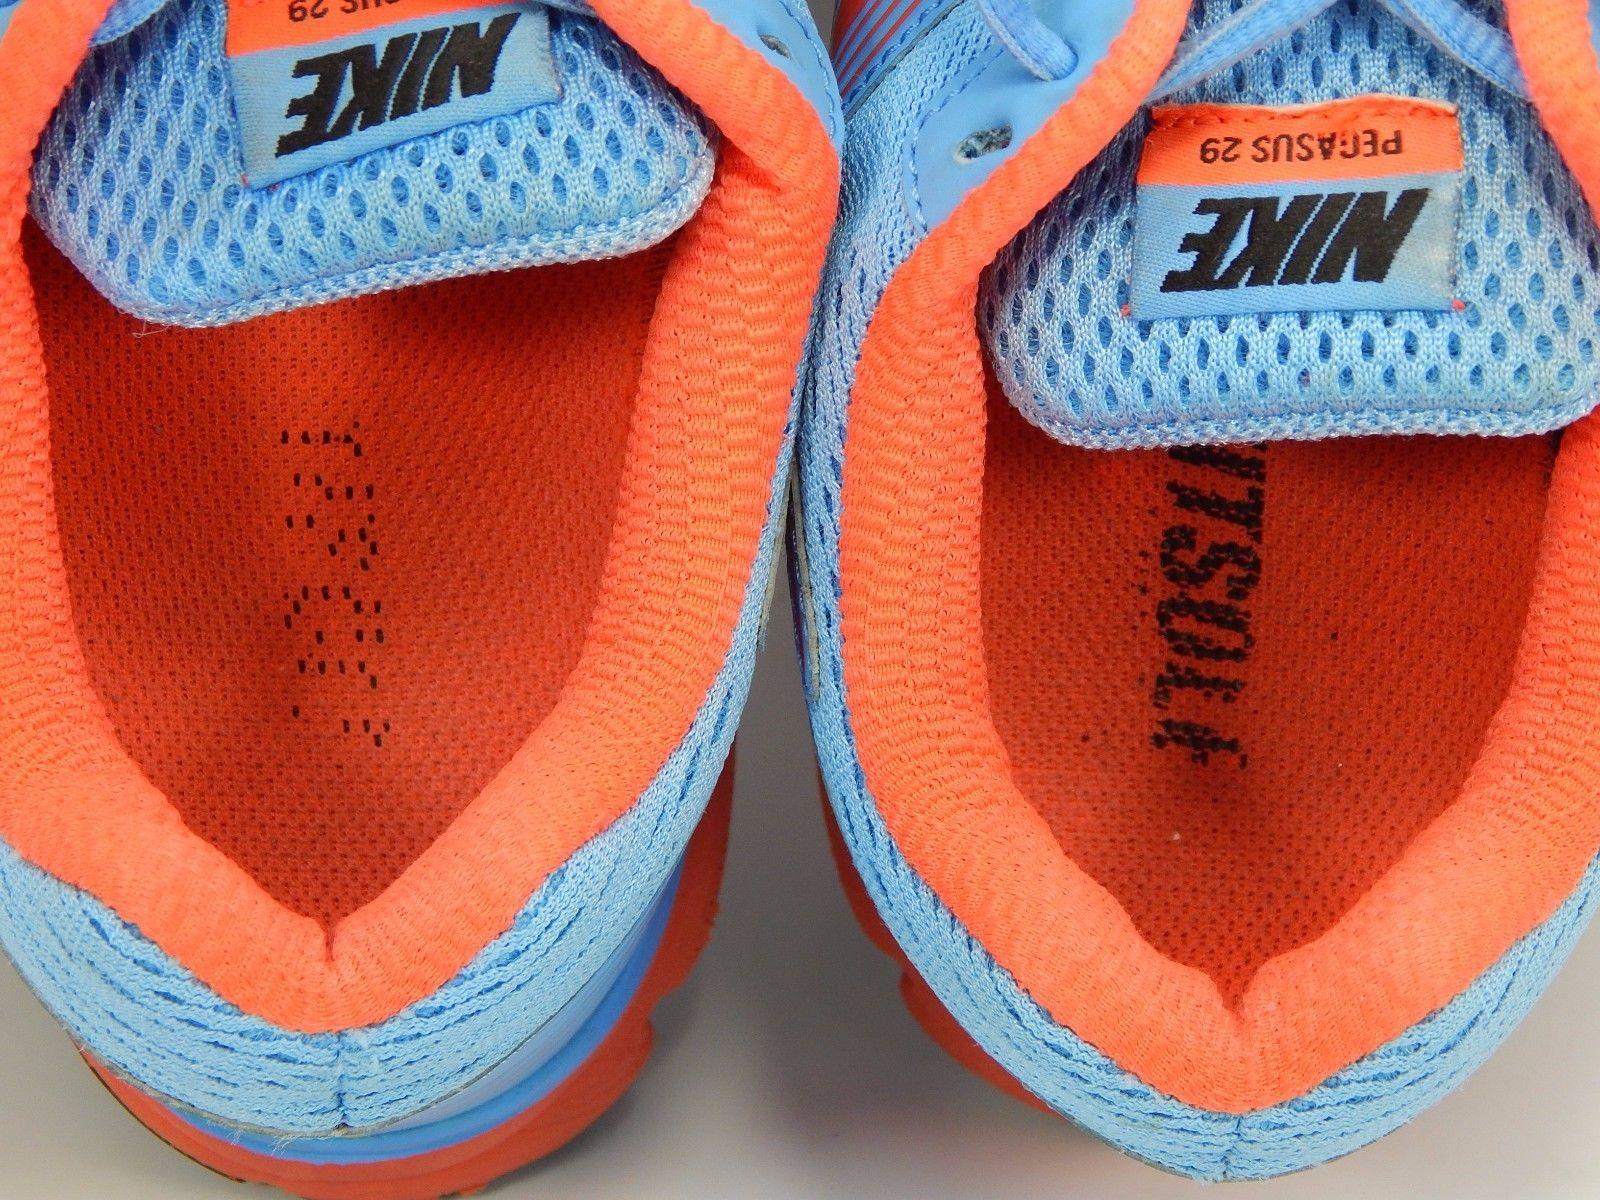 Nike Air Pegasus 29 Women's Running Shoes Size US 8.5 M (B) EU 40 524981-406